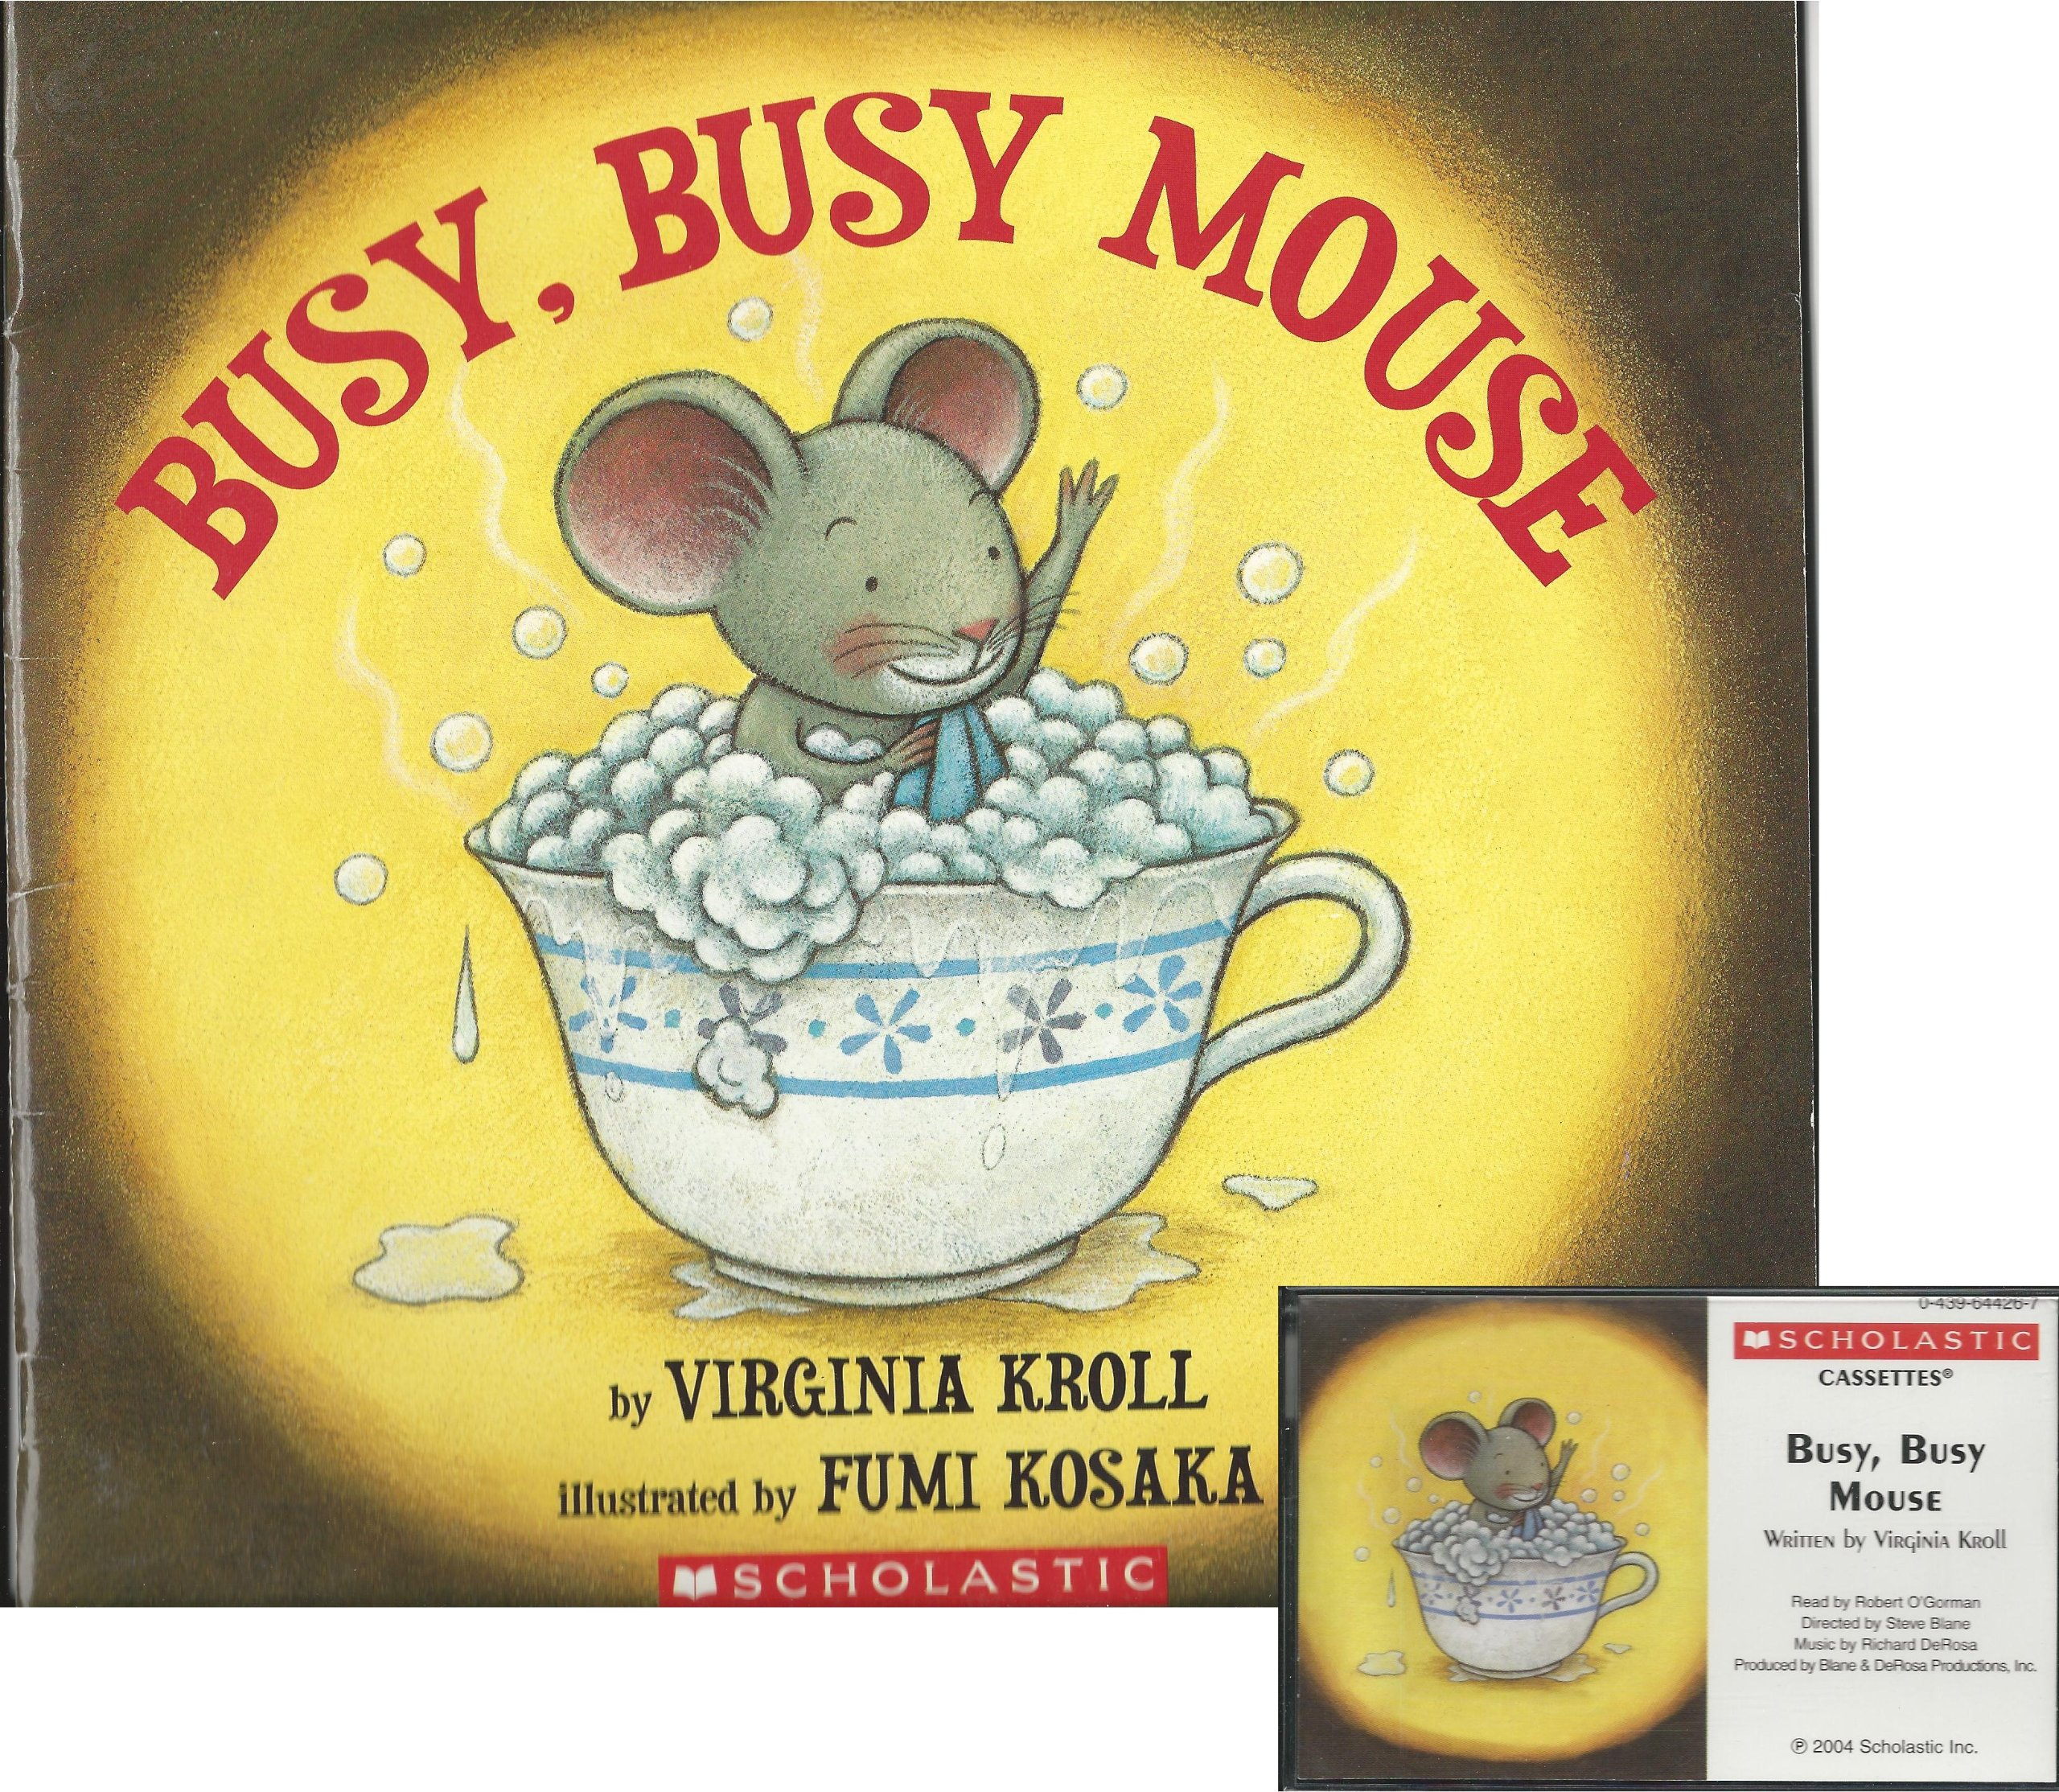 Busy, Busy Mouse Book and Audiocassette Tape Set (Paperback Book and Audio  Cassette Tape): Virginia Kroll, Fumi Kosaka, Robert O'Gorman: Amazon.com:  Books